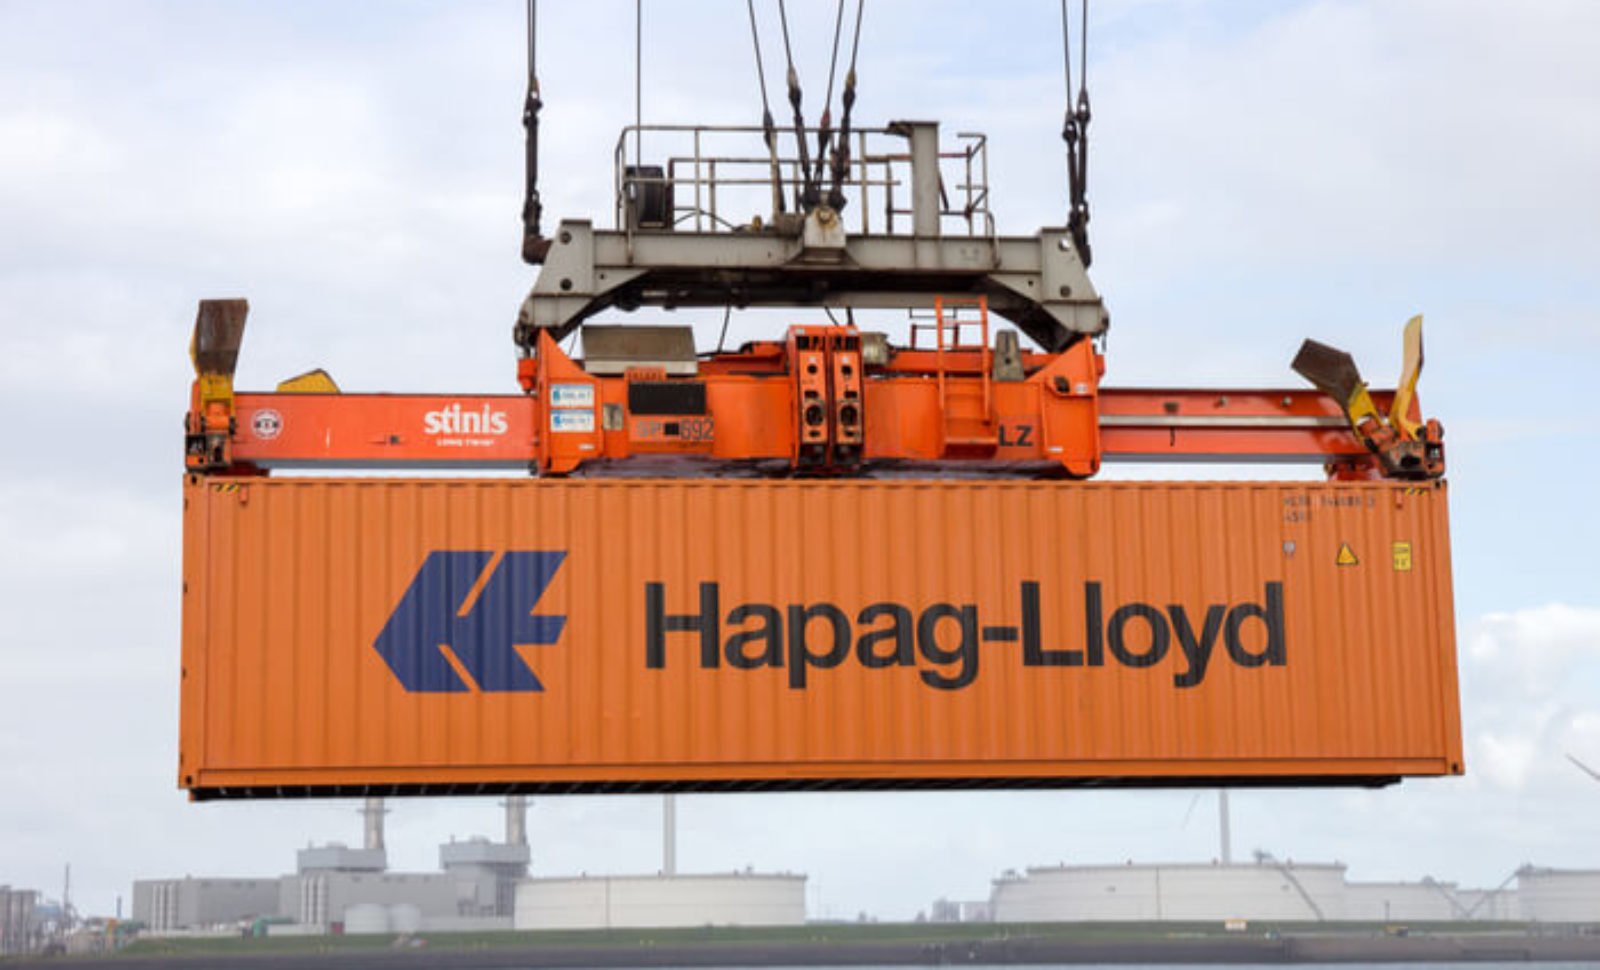 Seefracht: Startet Hapag-Lloyd ein neues Preismodell?